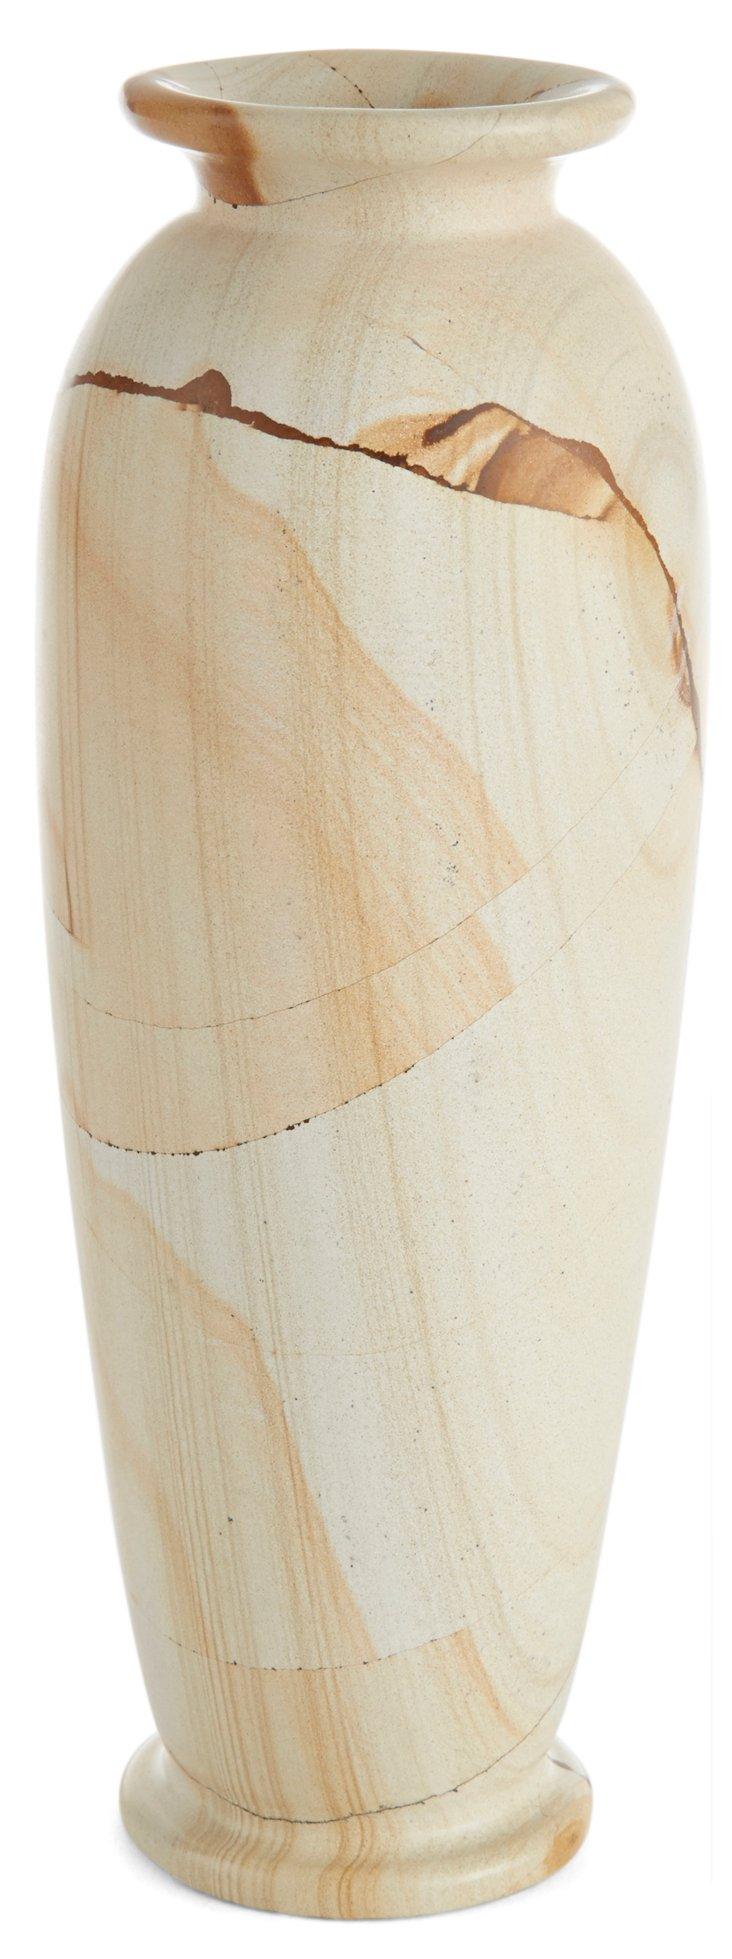 "8"" Marlstone Matka Vase, Natural"